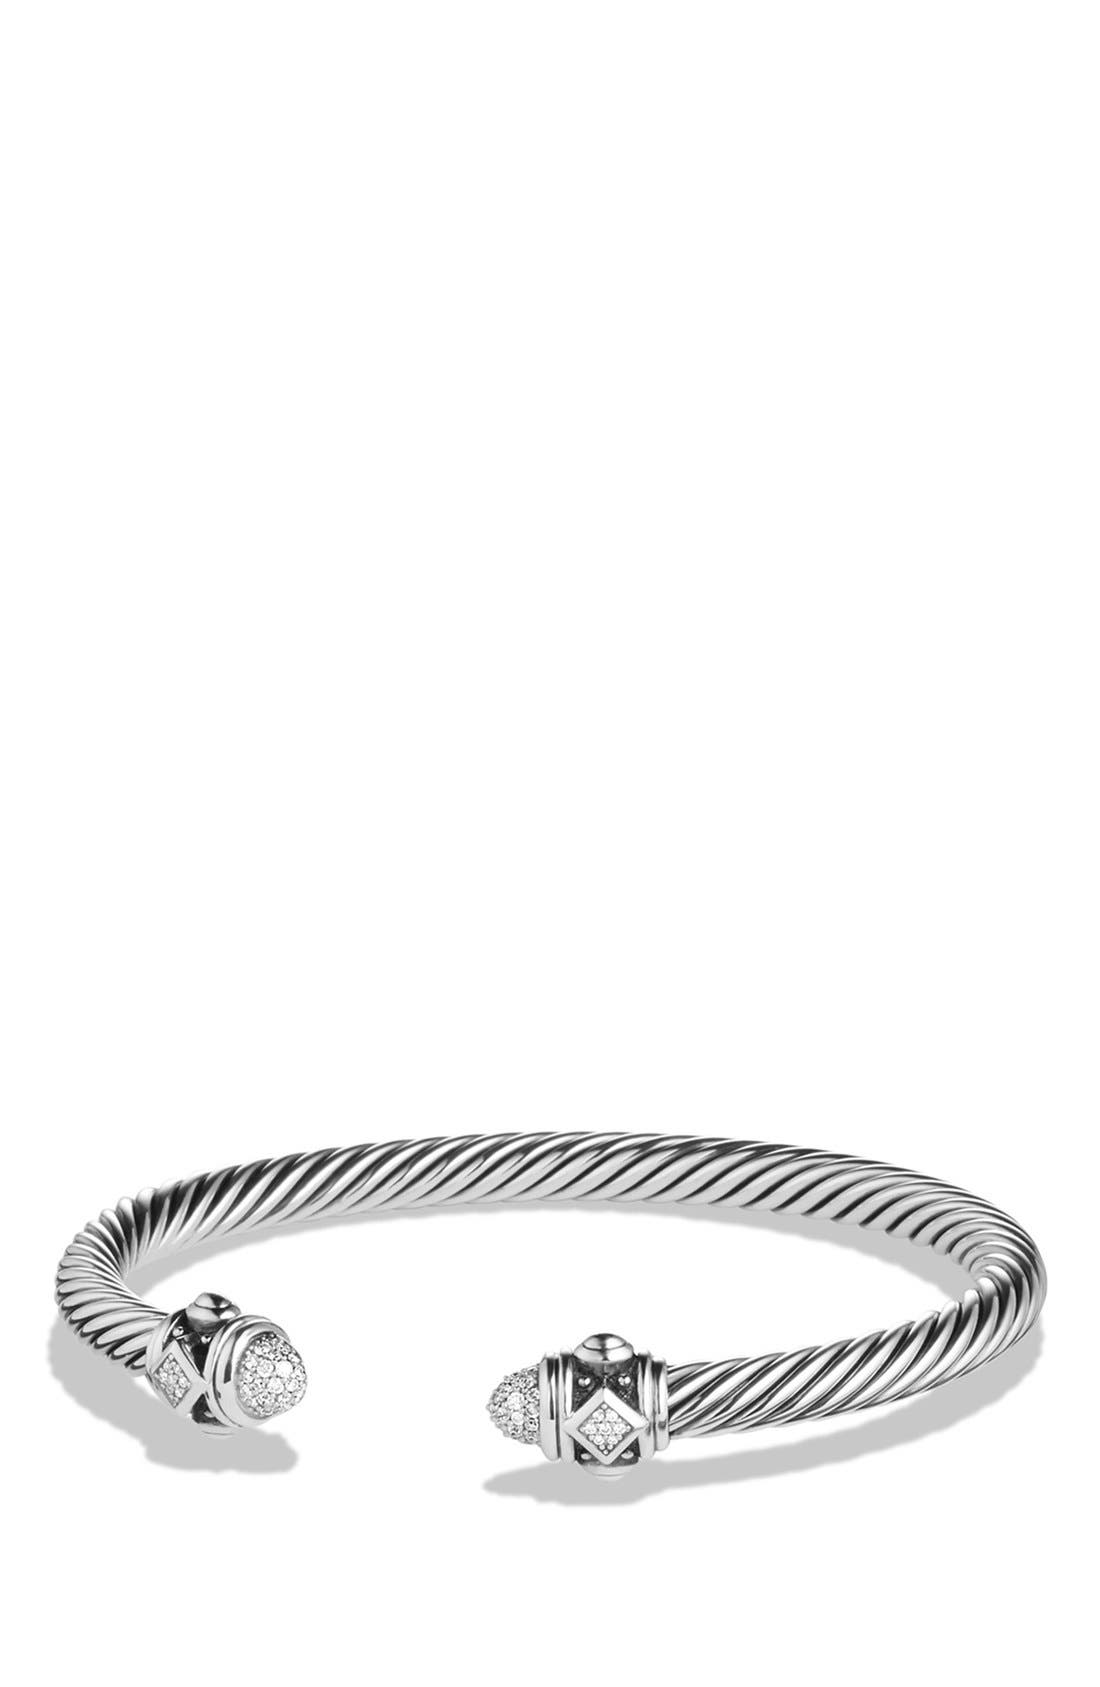 Main Image - David Yurman 'Renaissance' Bracelet with Diamonds in Silver